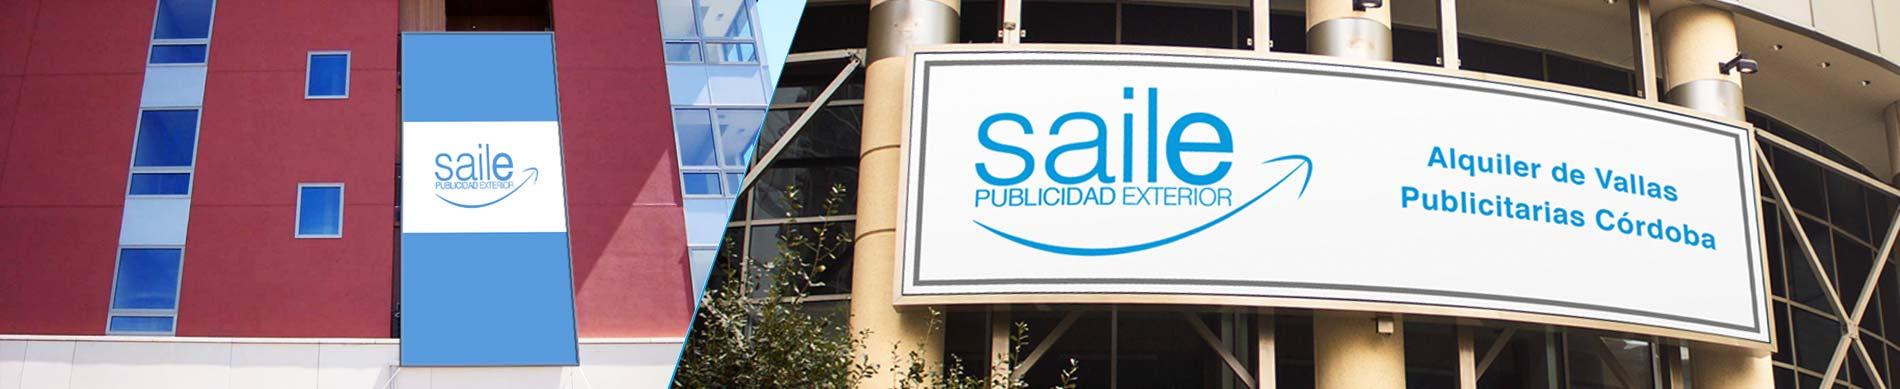 Campañas publicitarias en Córdoba